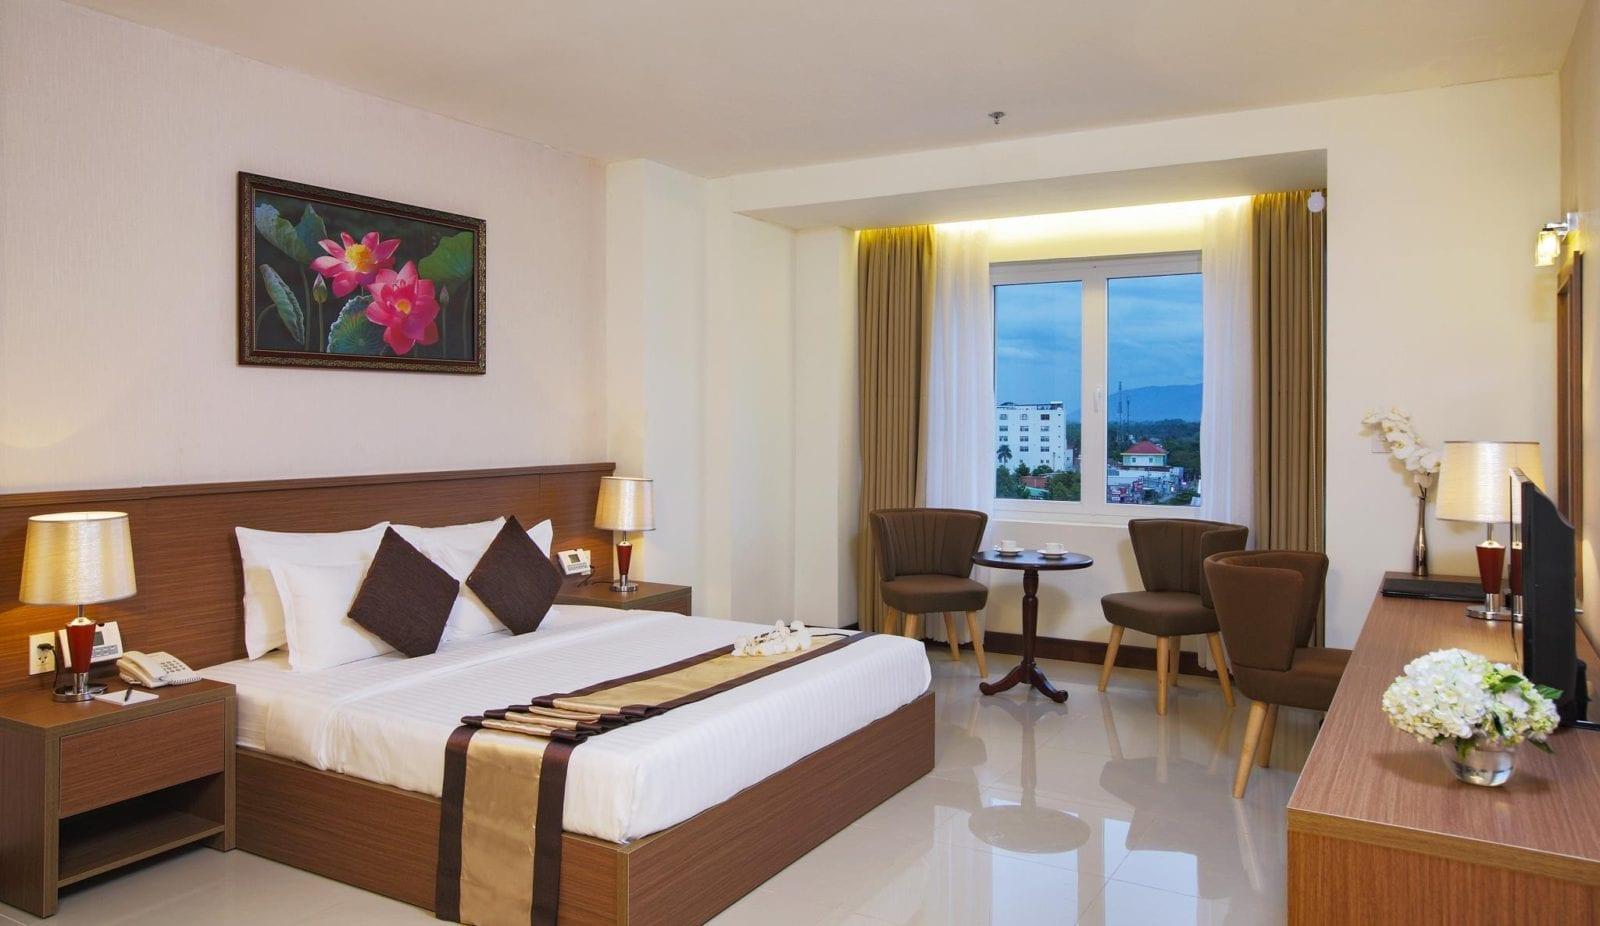 Room at Sunrise Hotel